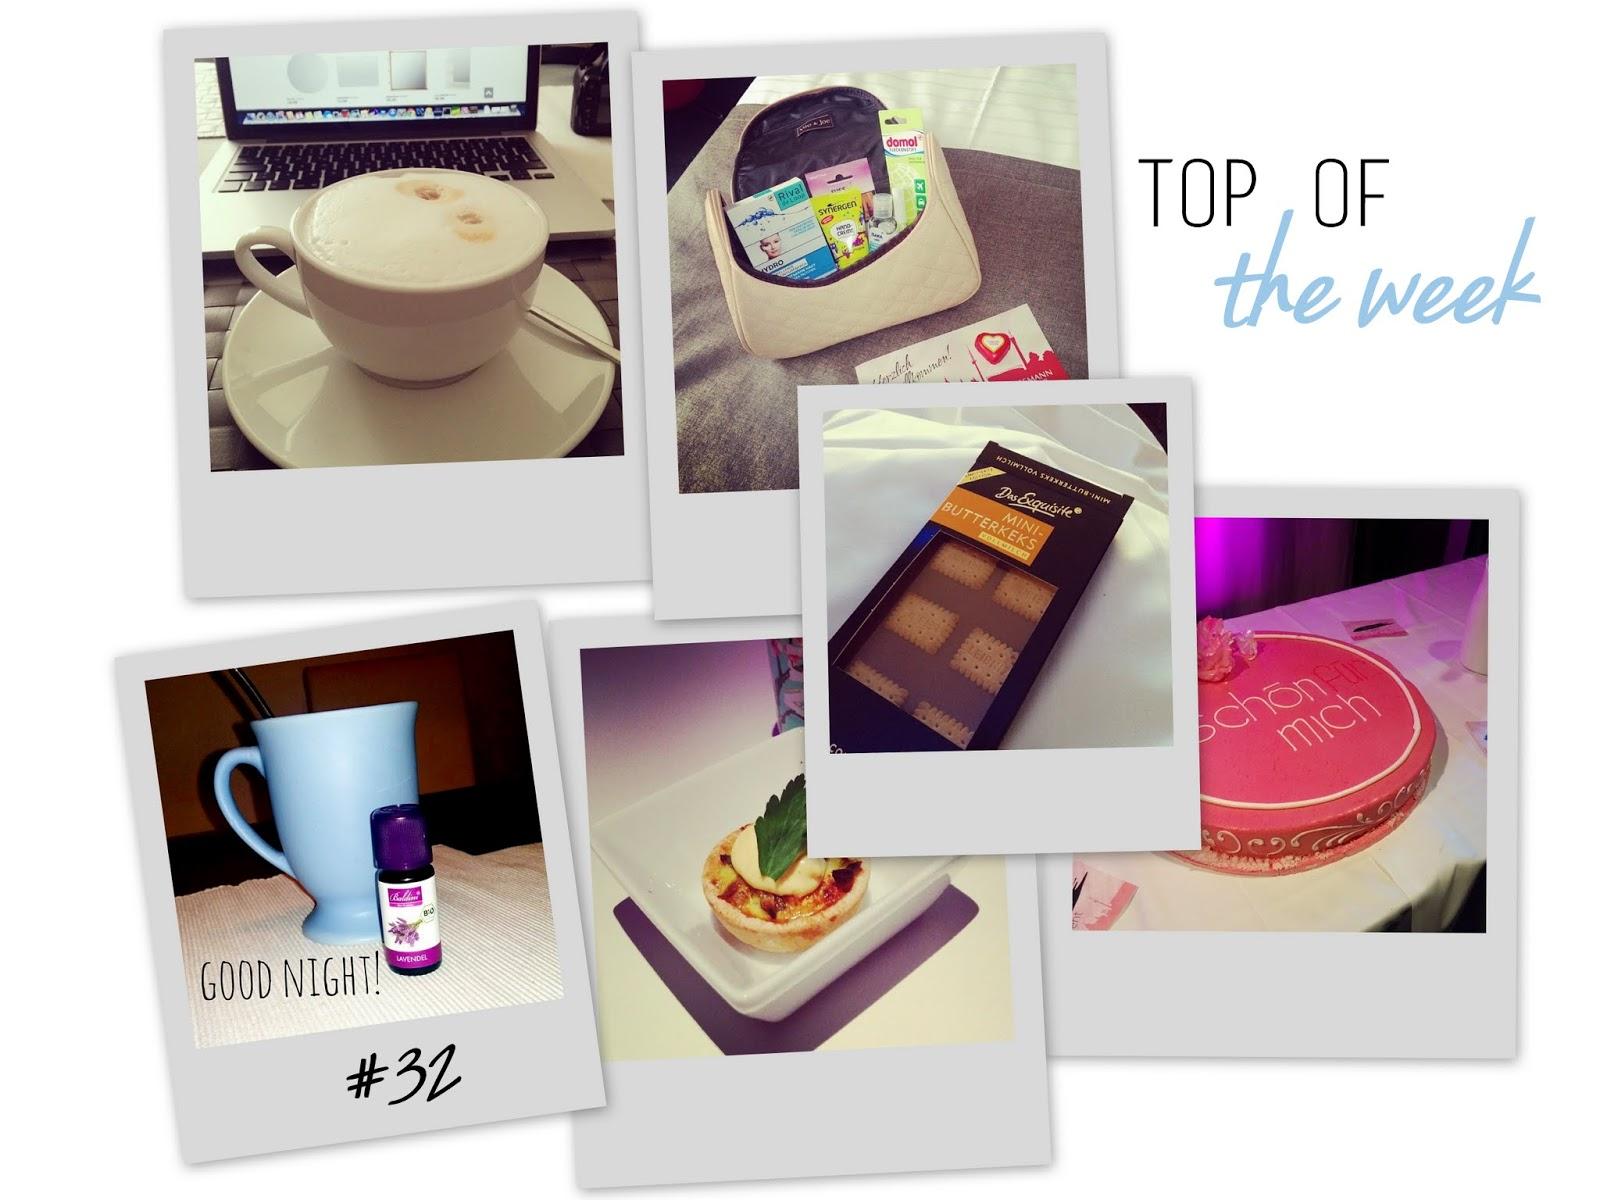 Top of the Week Rossmann Bloggerevent